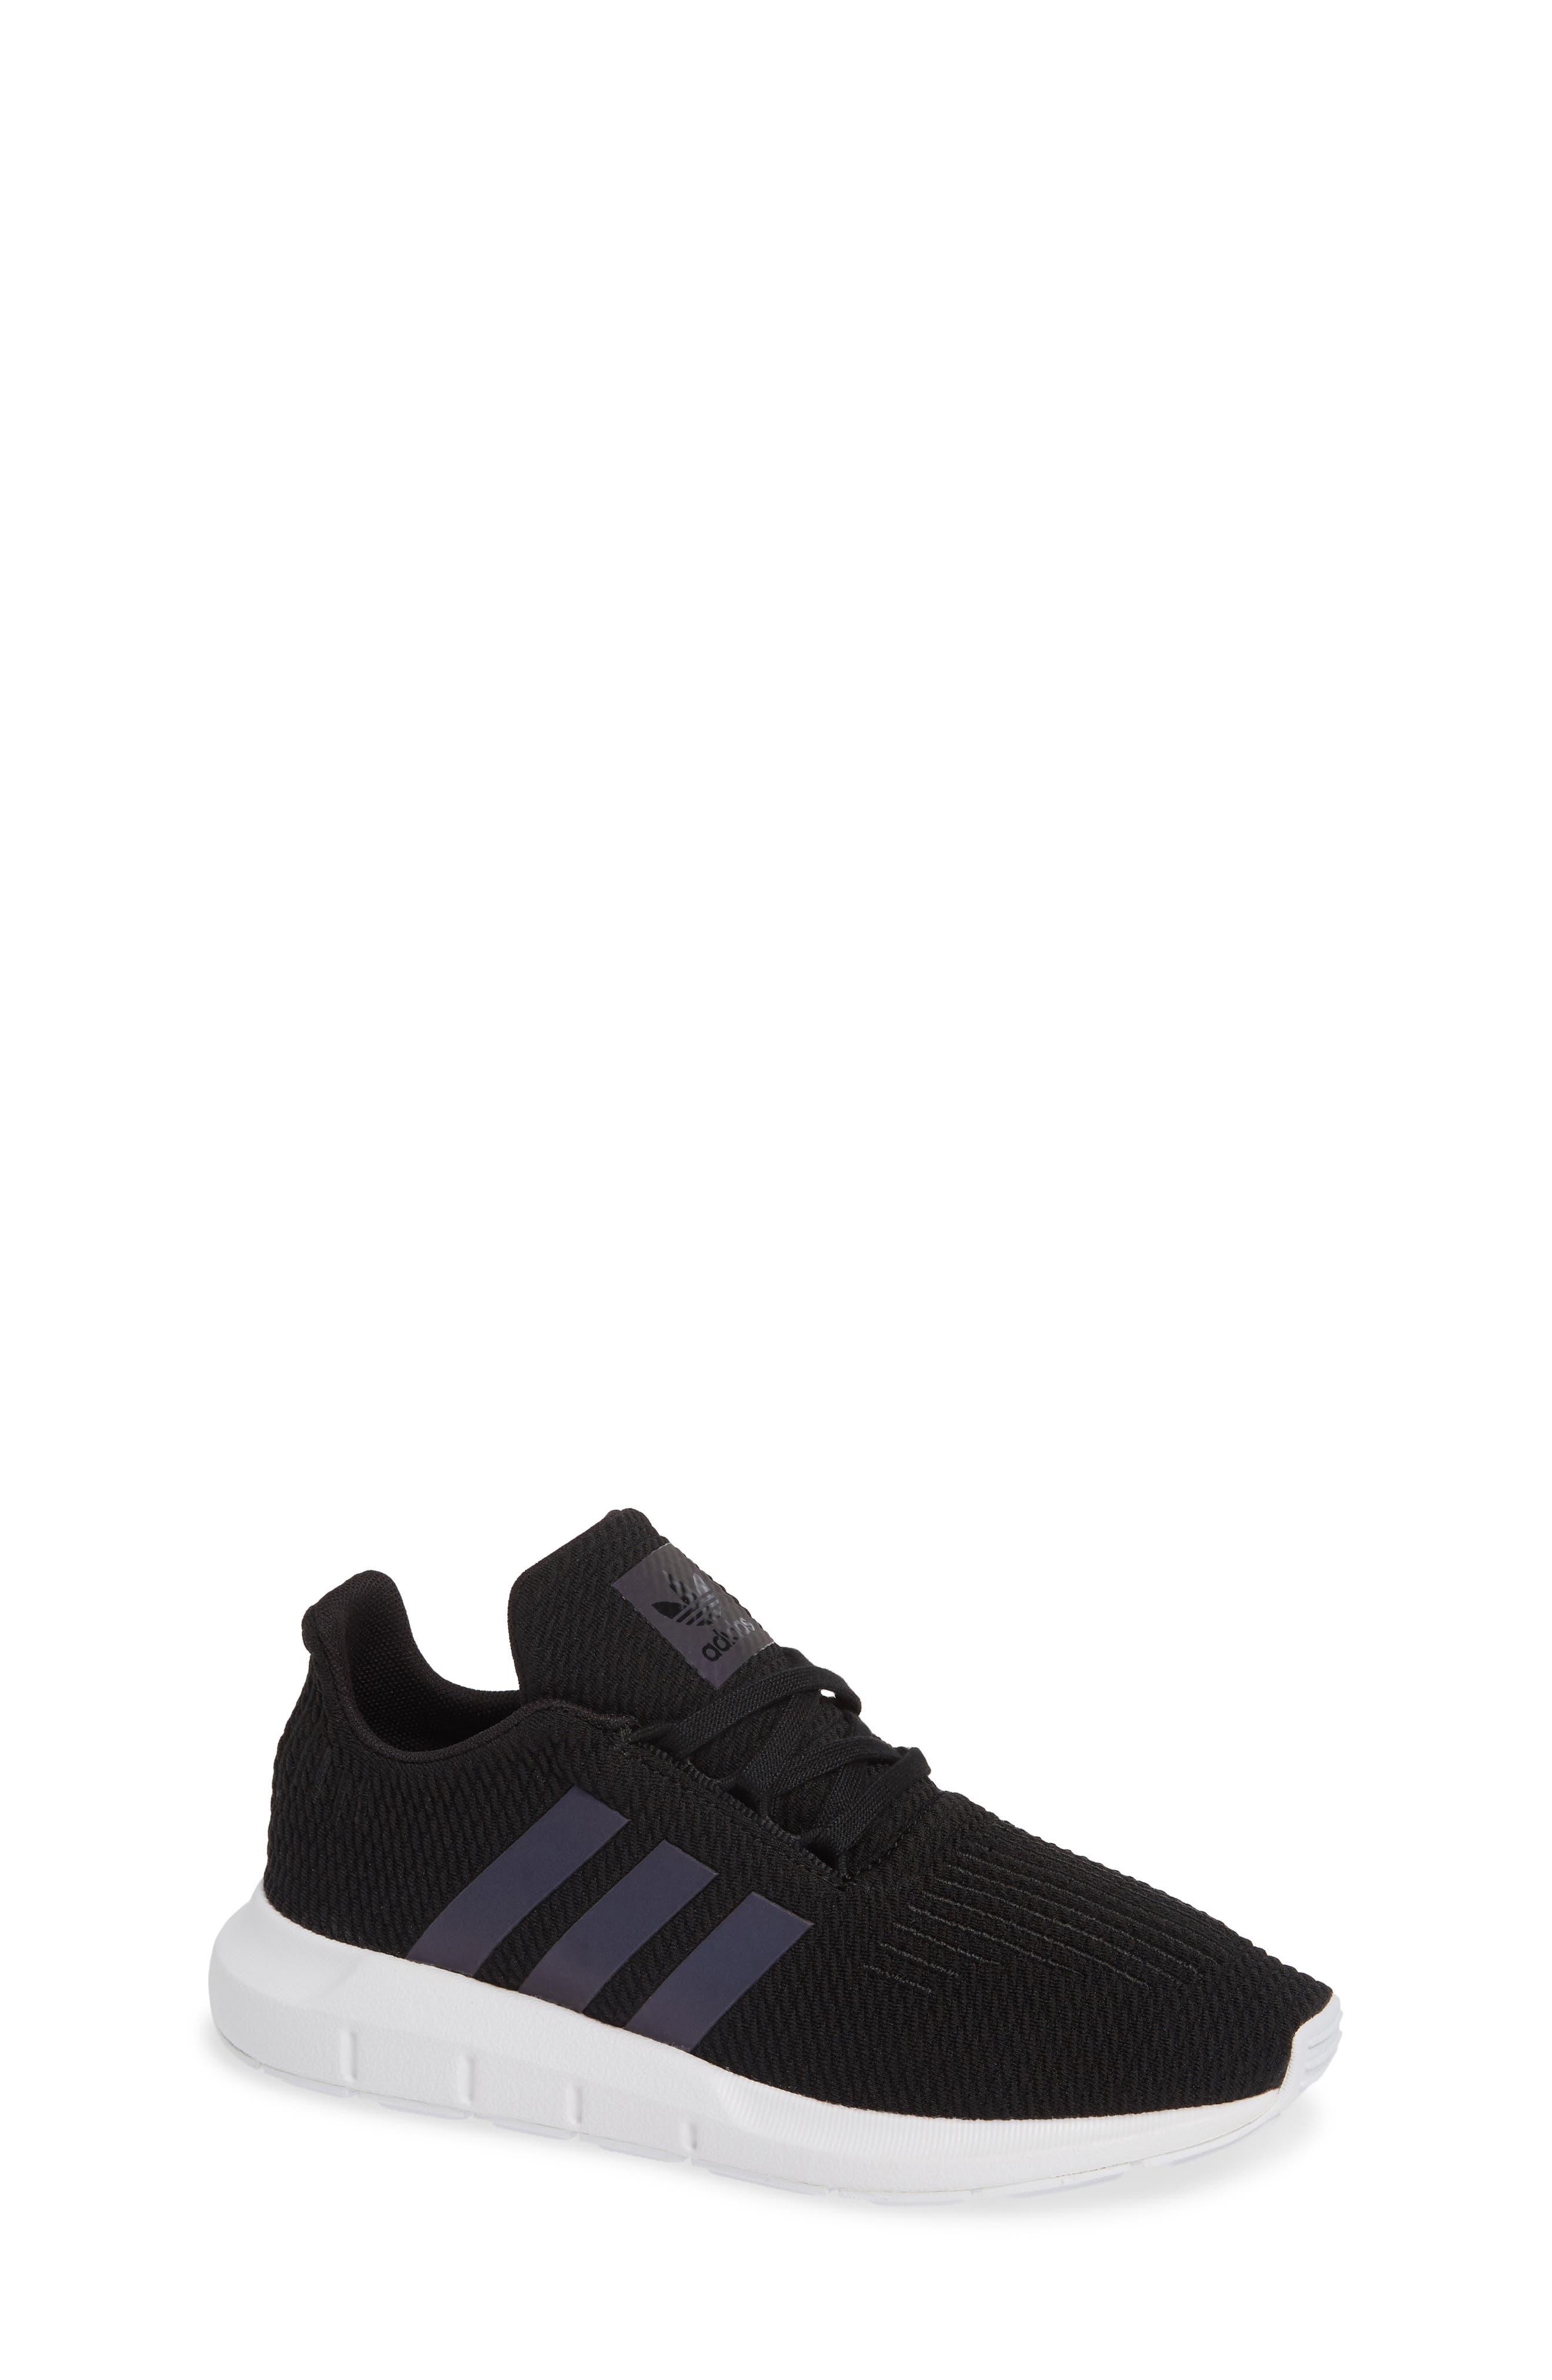 ADIDAS Swift Run J Sneaker, Main, color, CORE BLACK/ WHITE